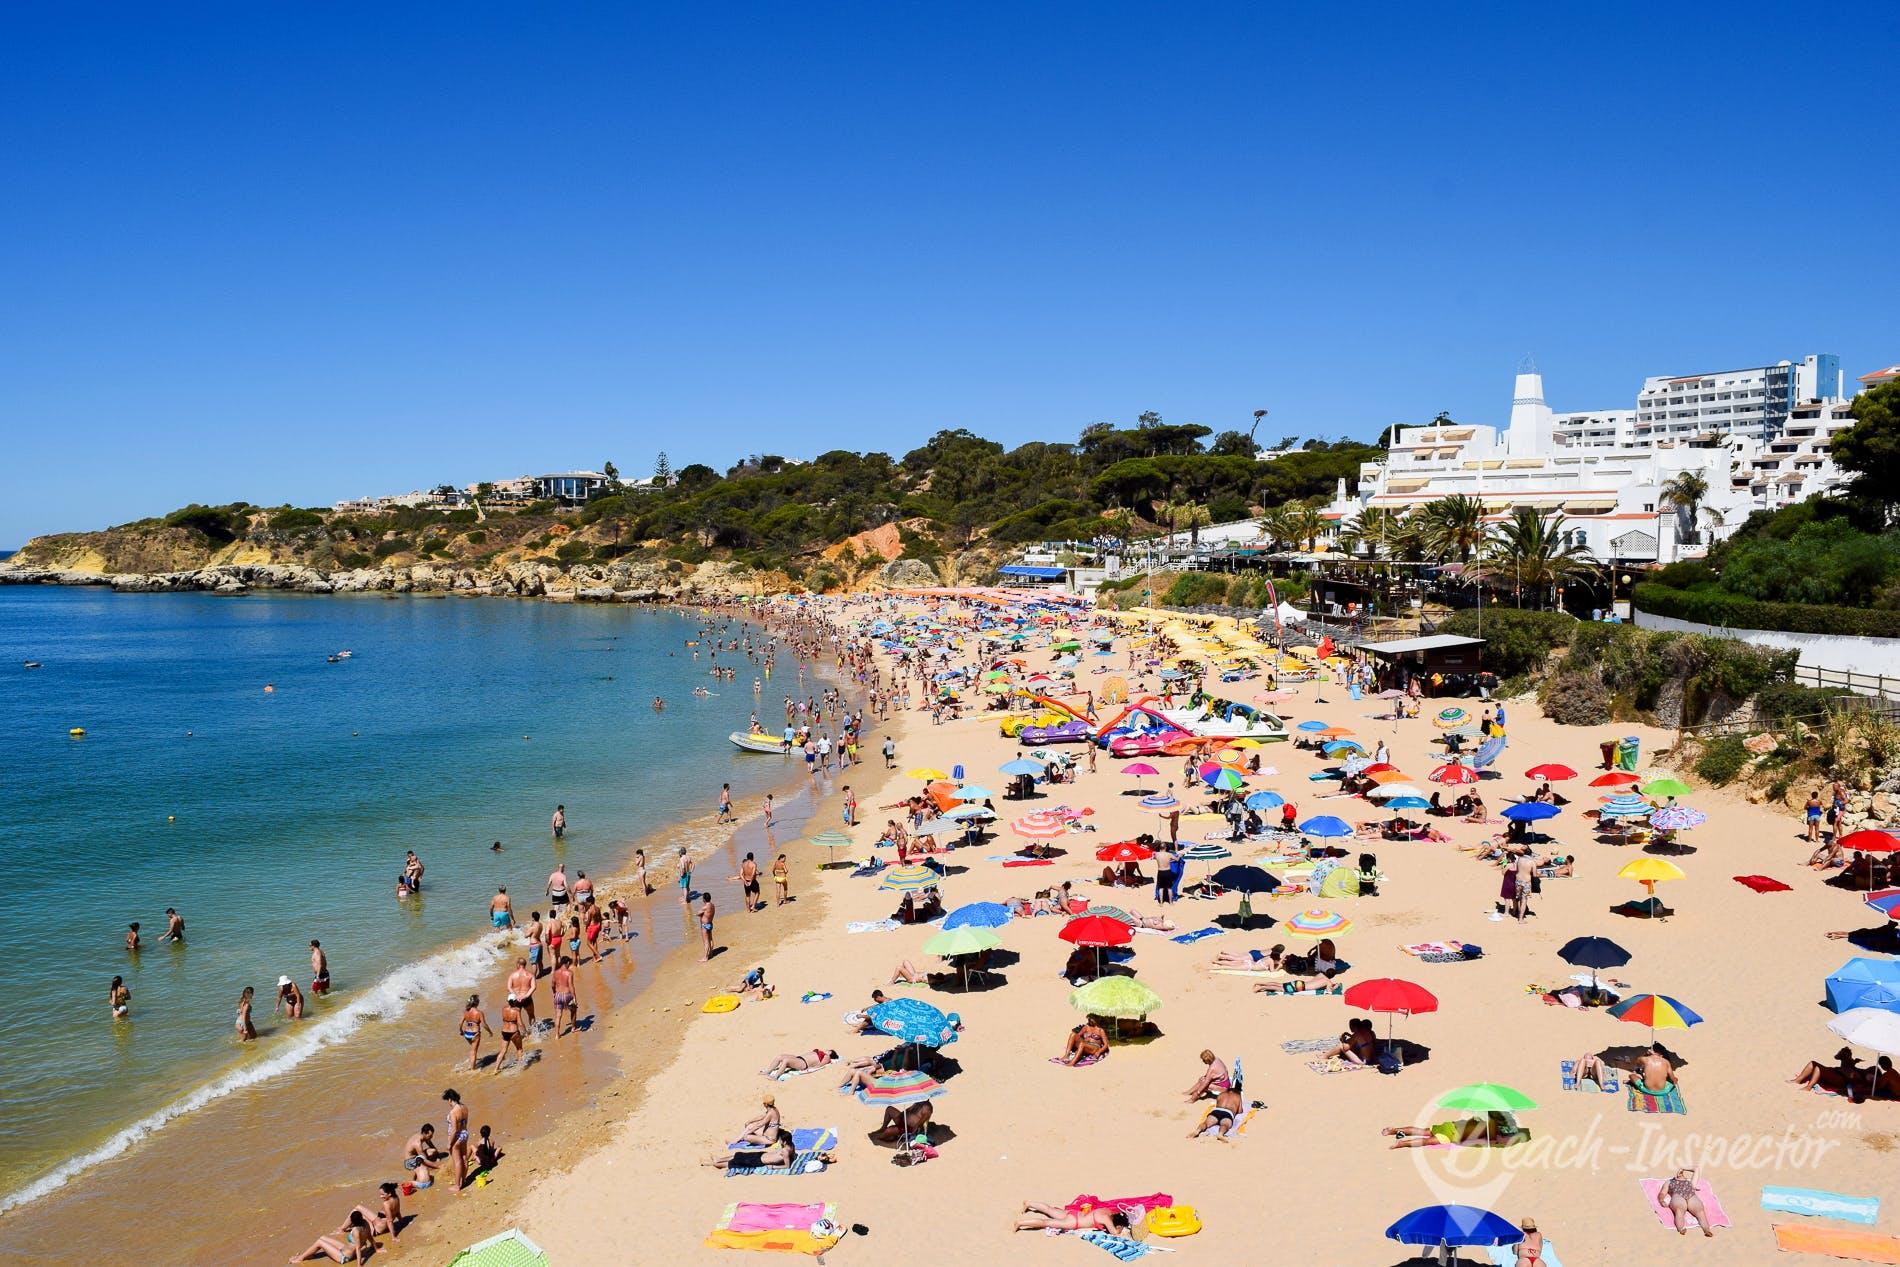 Strand Praia da Oura, Algarve, Portugal